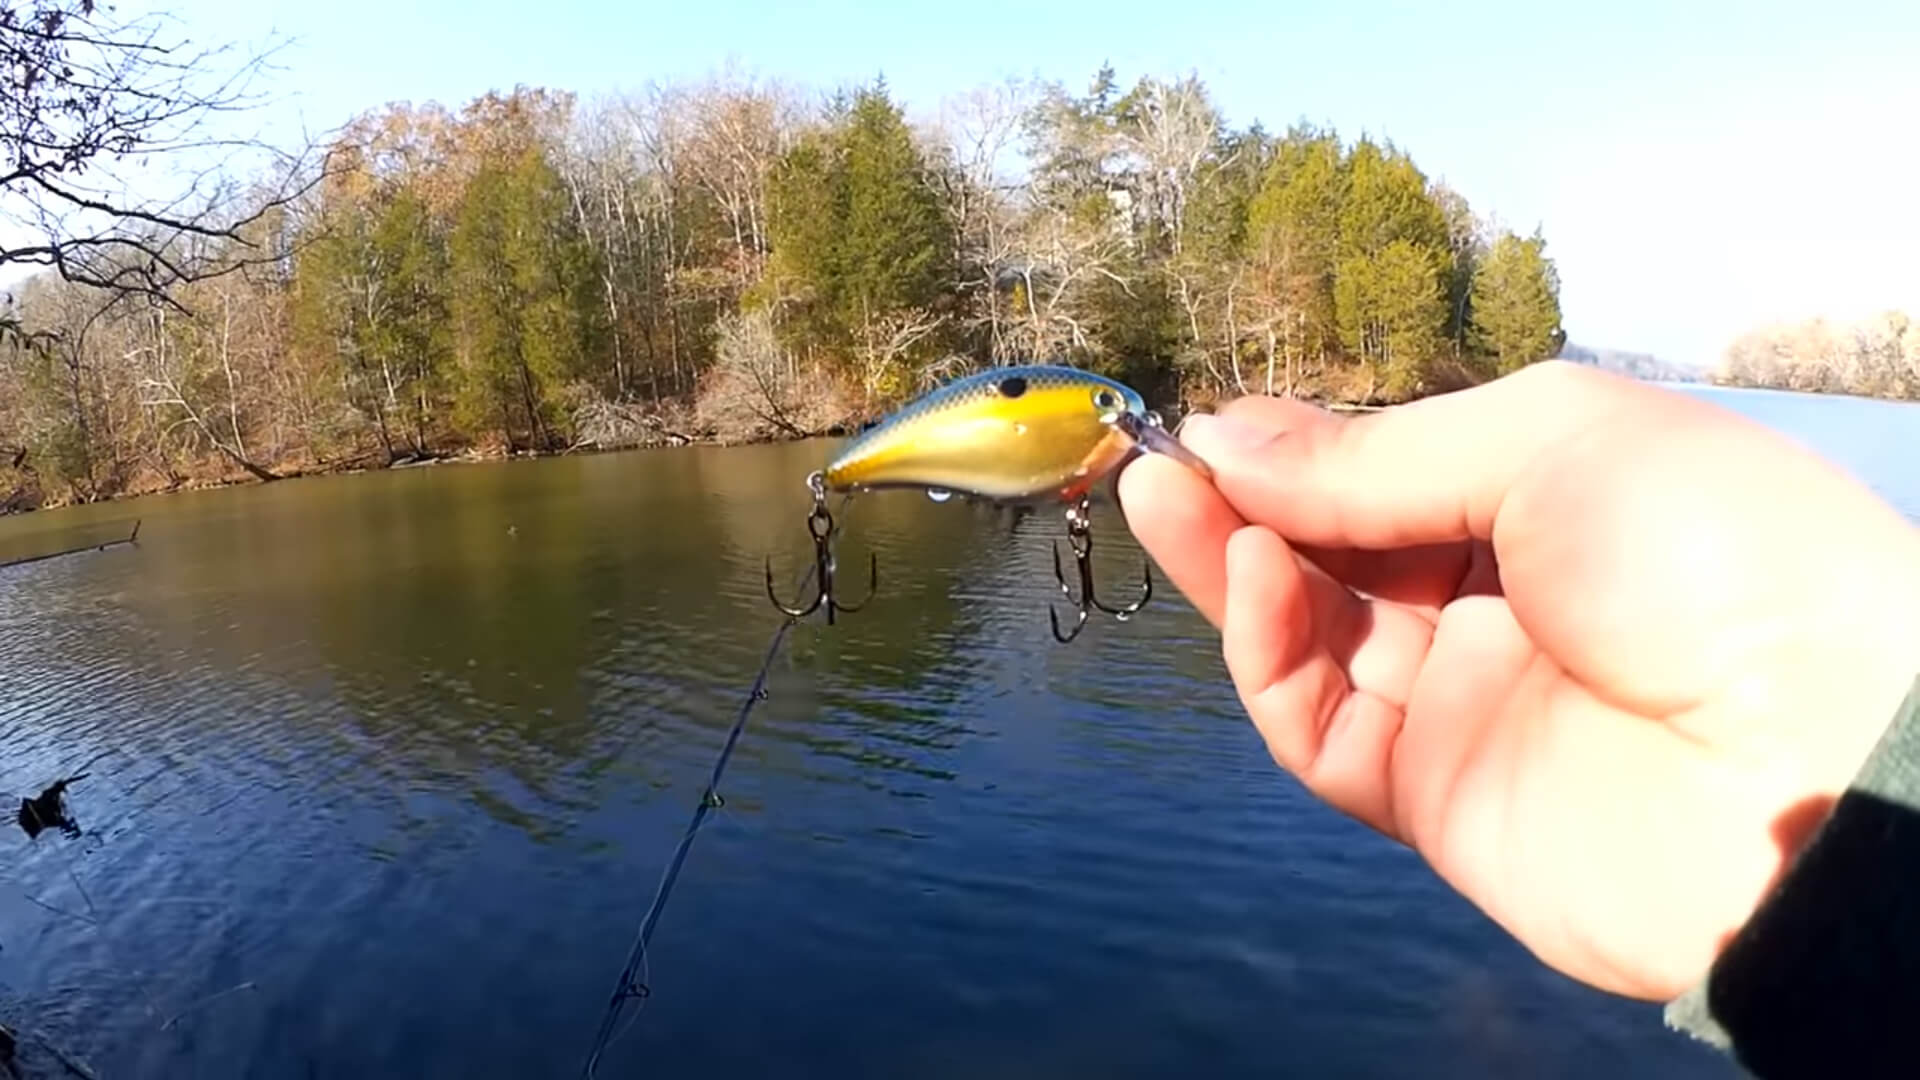 Bass Fishing with a Strike King KVD 1.5 Squarebill Crankbait - Realistic Fishing